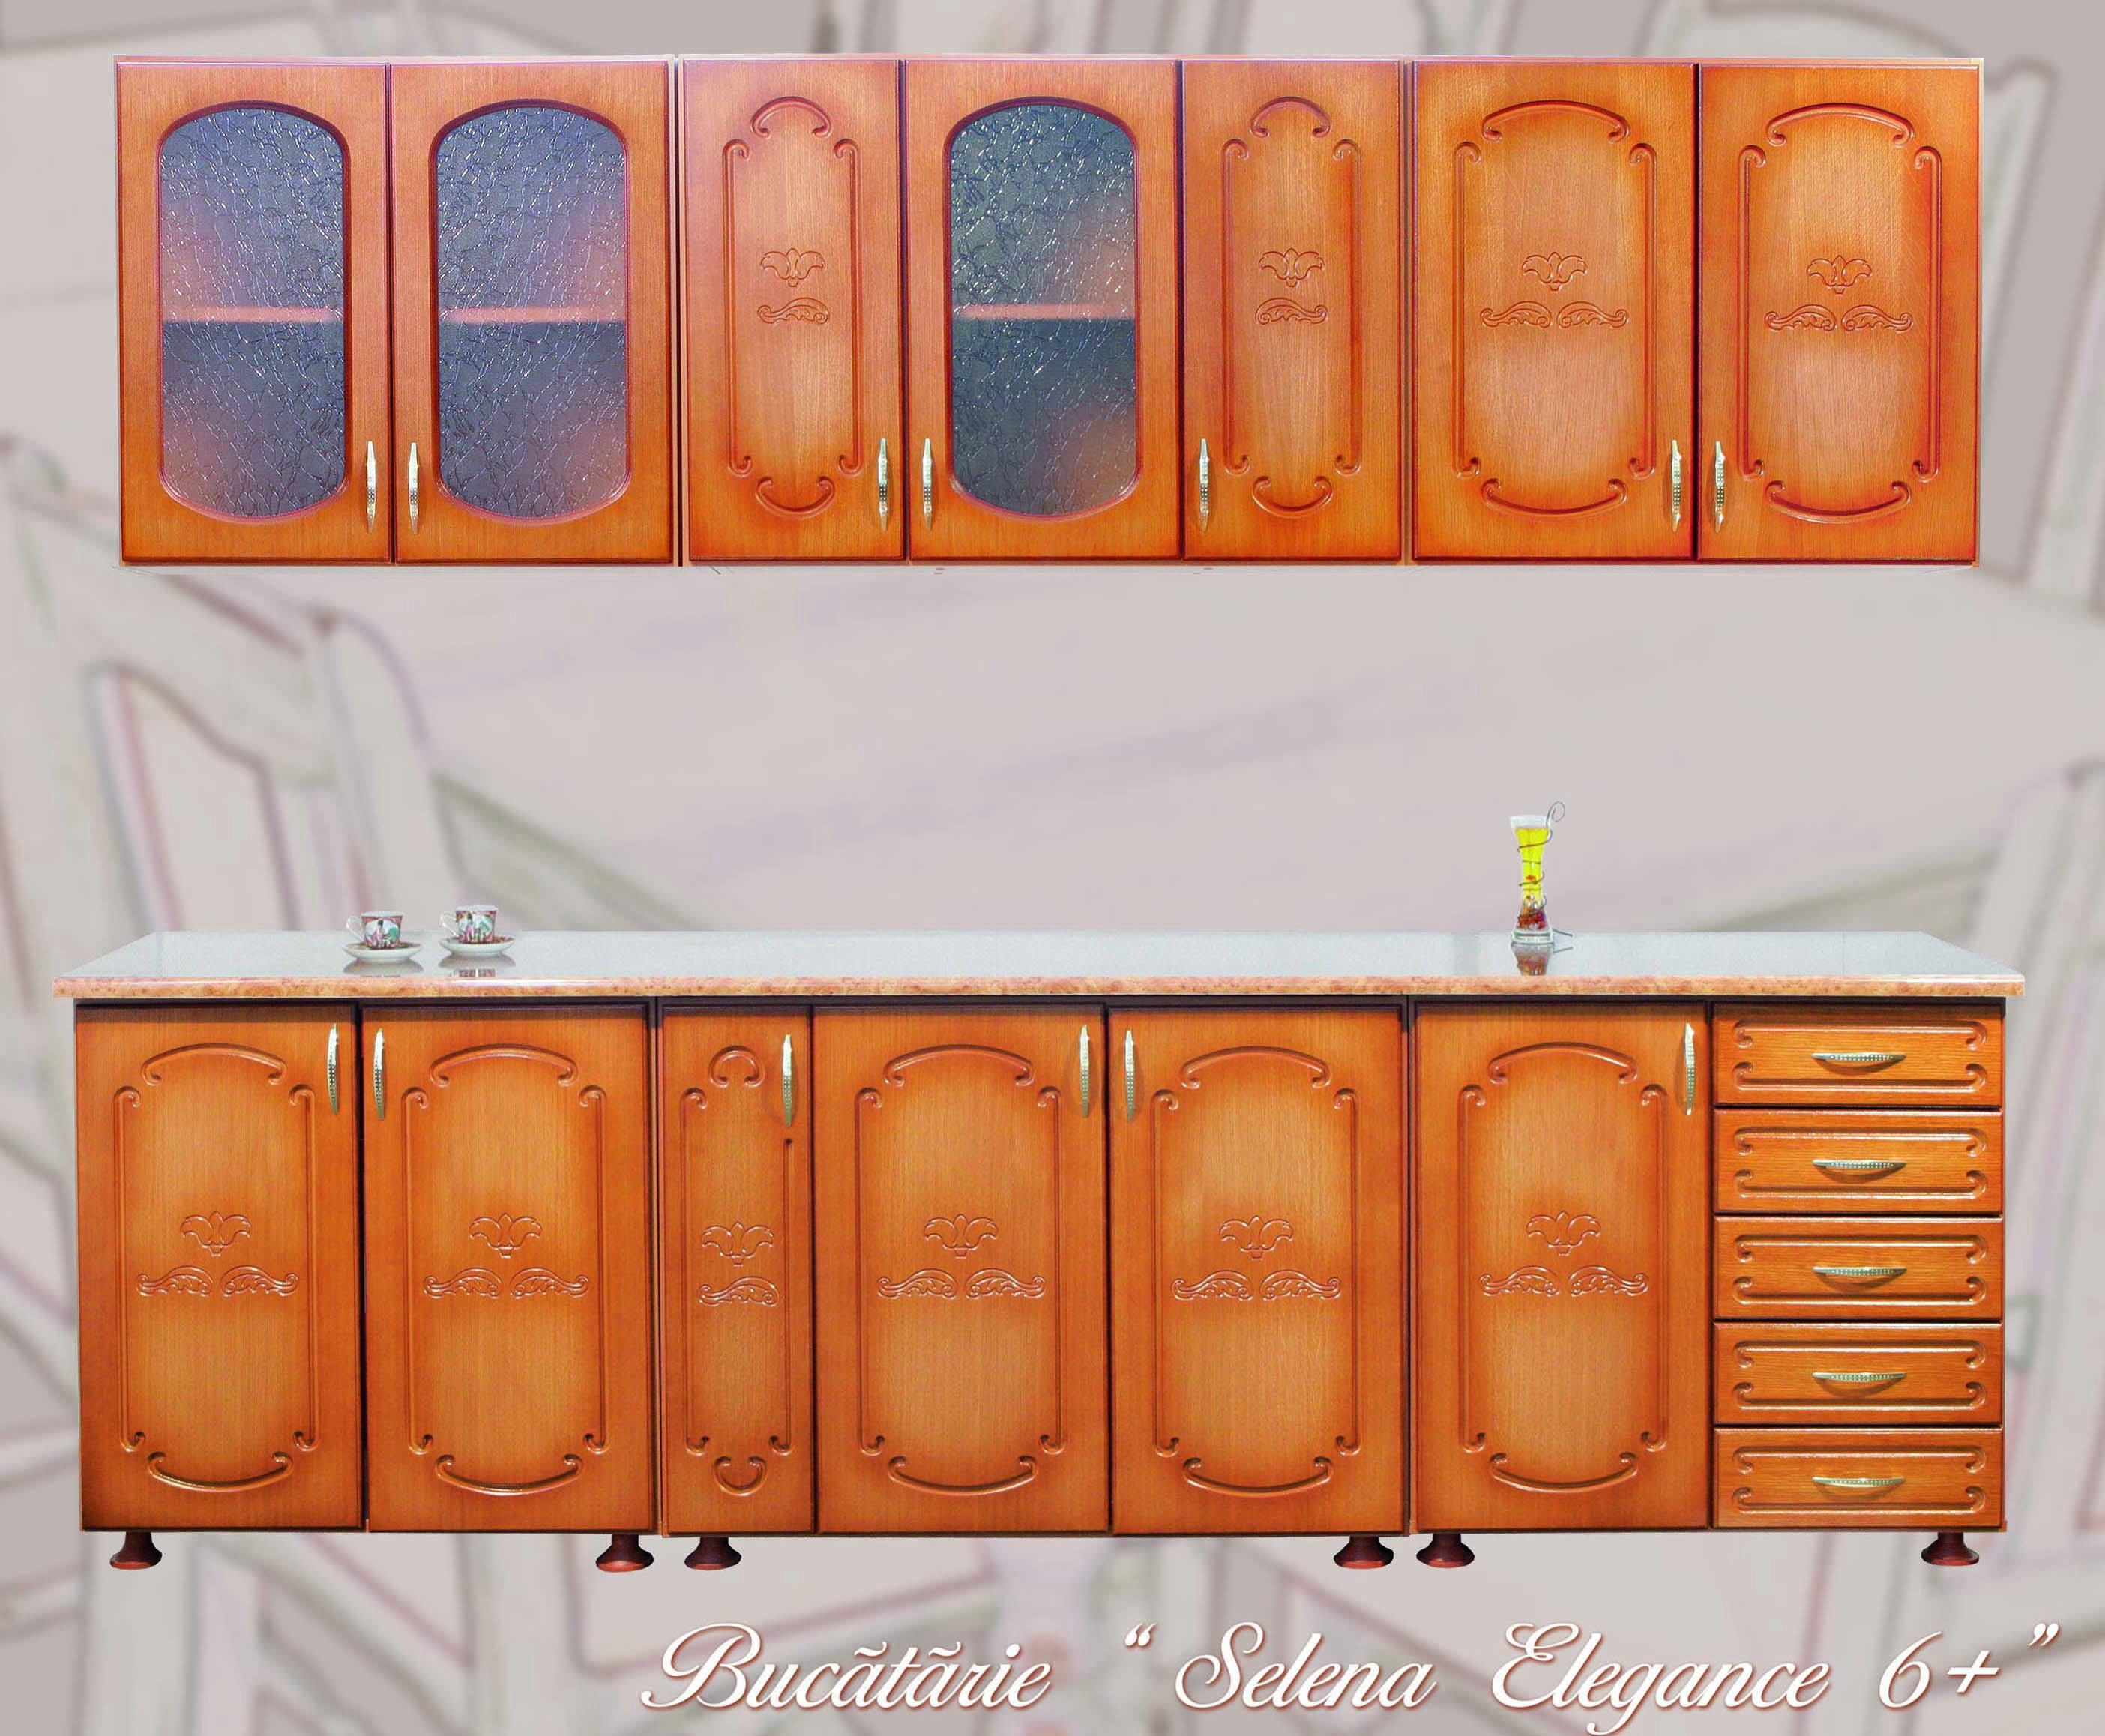 Gabinetes de cocina dise o 700 0 700 0 piezas mensual for Disenos de gabinetes de cocina